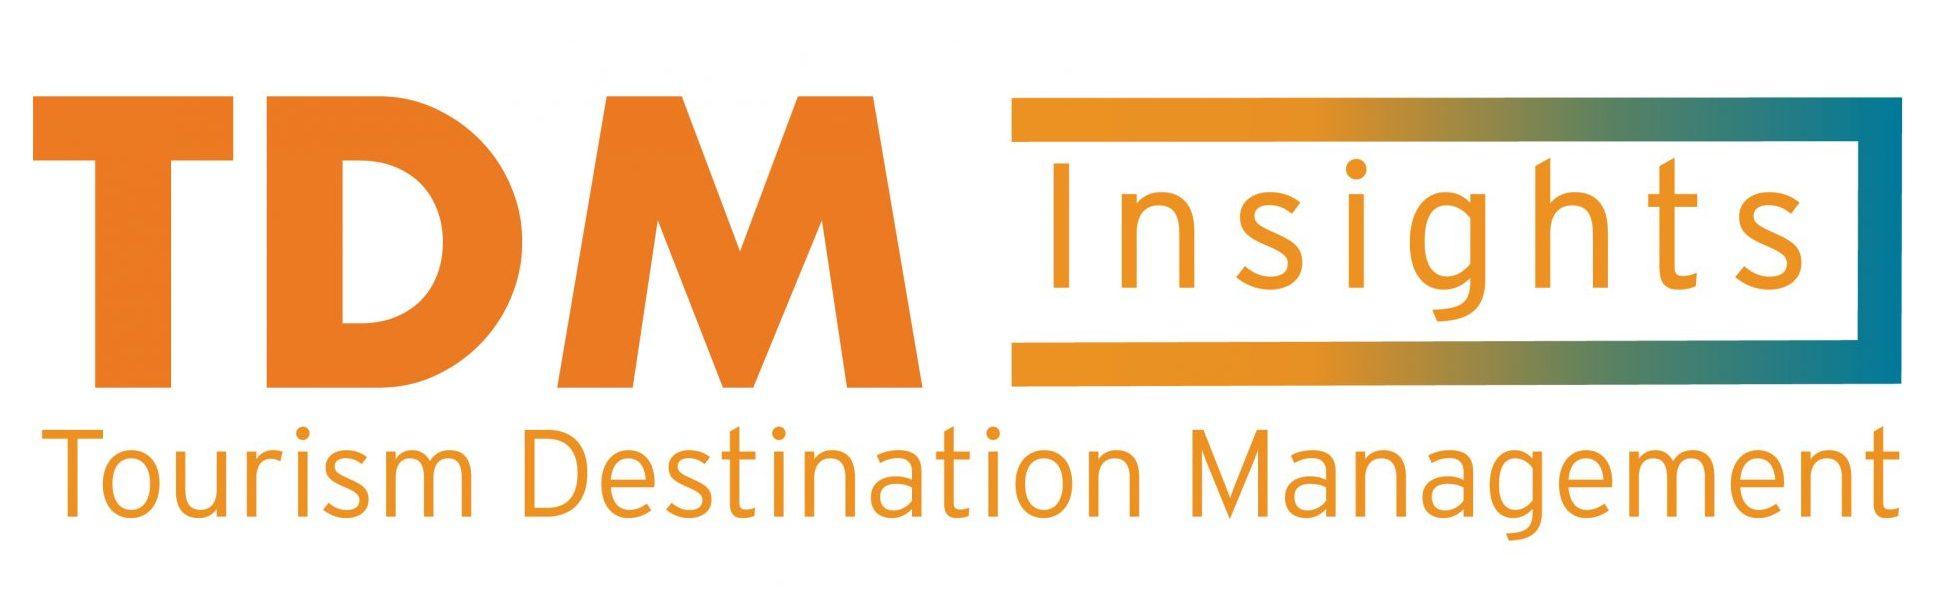 TDM Insights